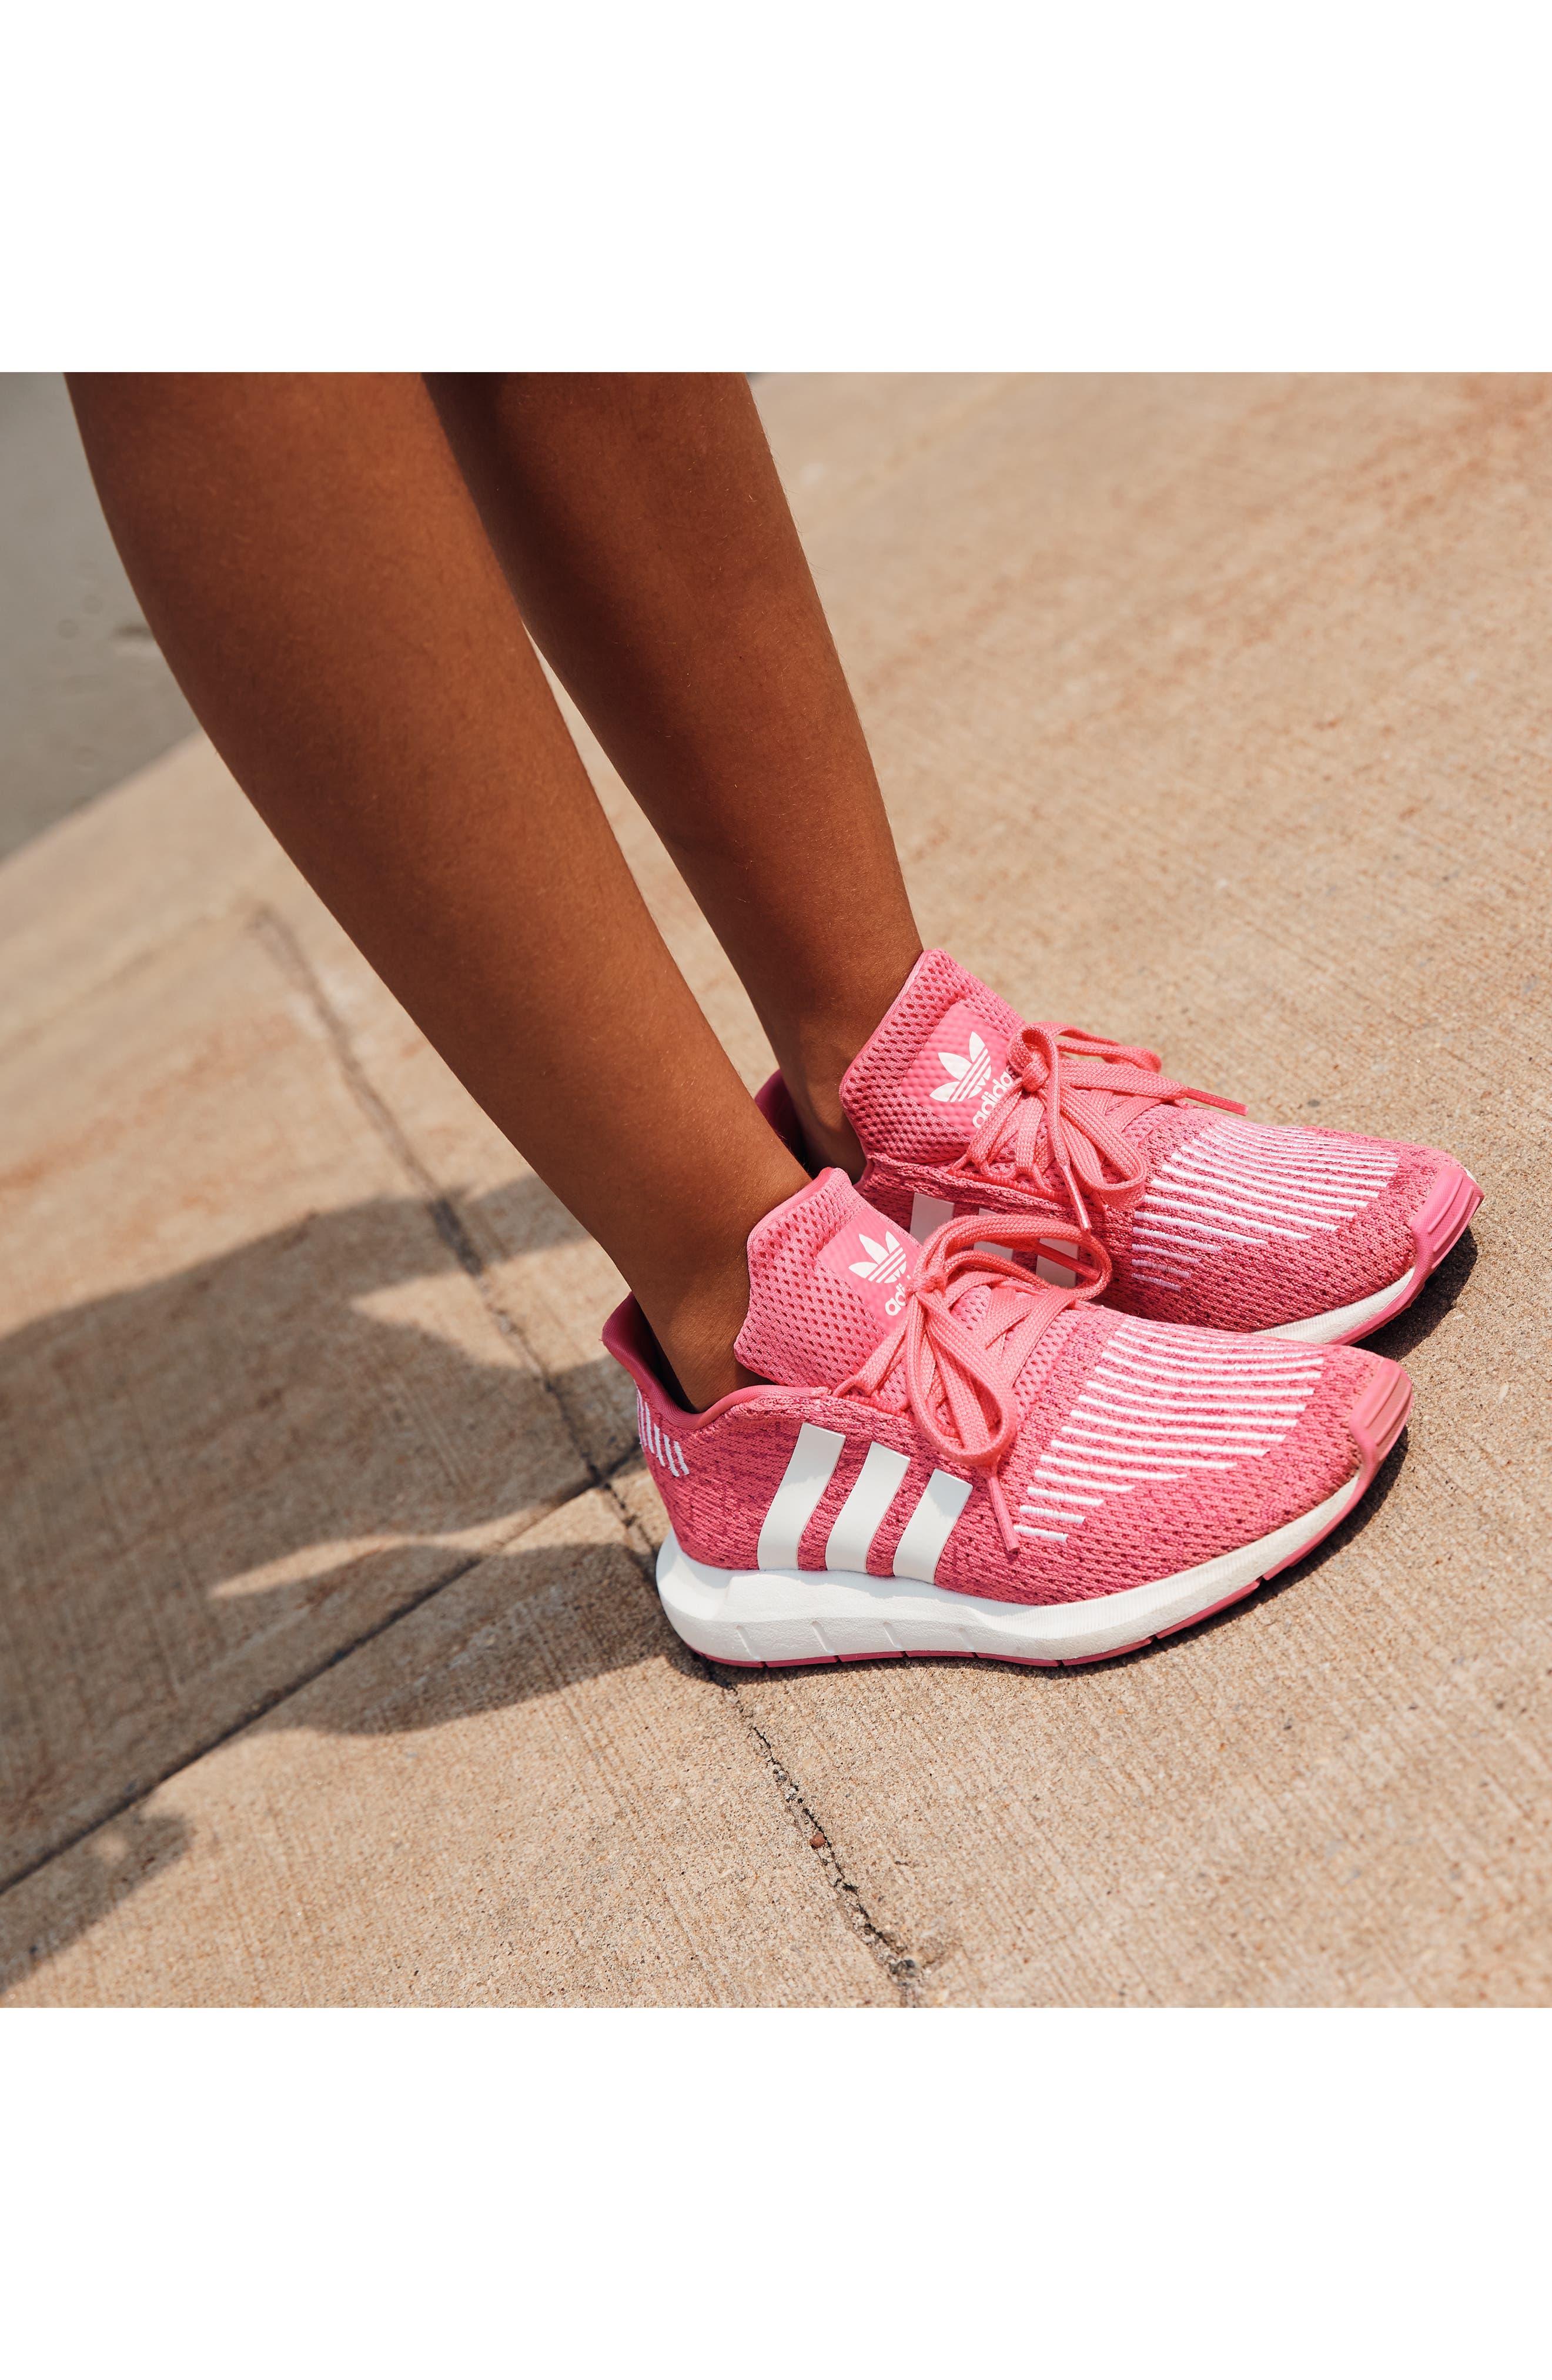 Swift Run J Sneaker,                             Alternate thumbnail 8, color,                             SEMI SOLAR PINK/ WHITE